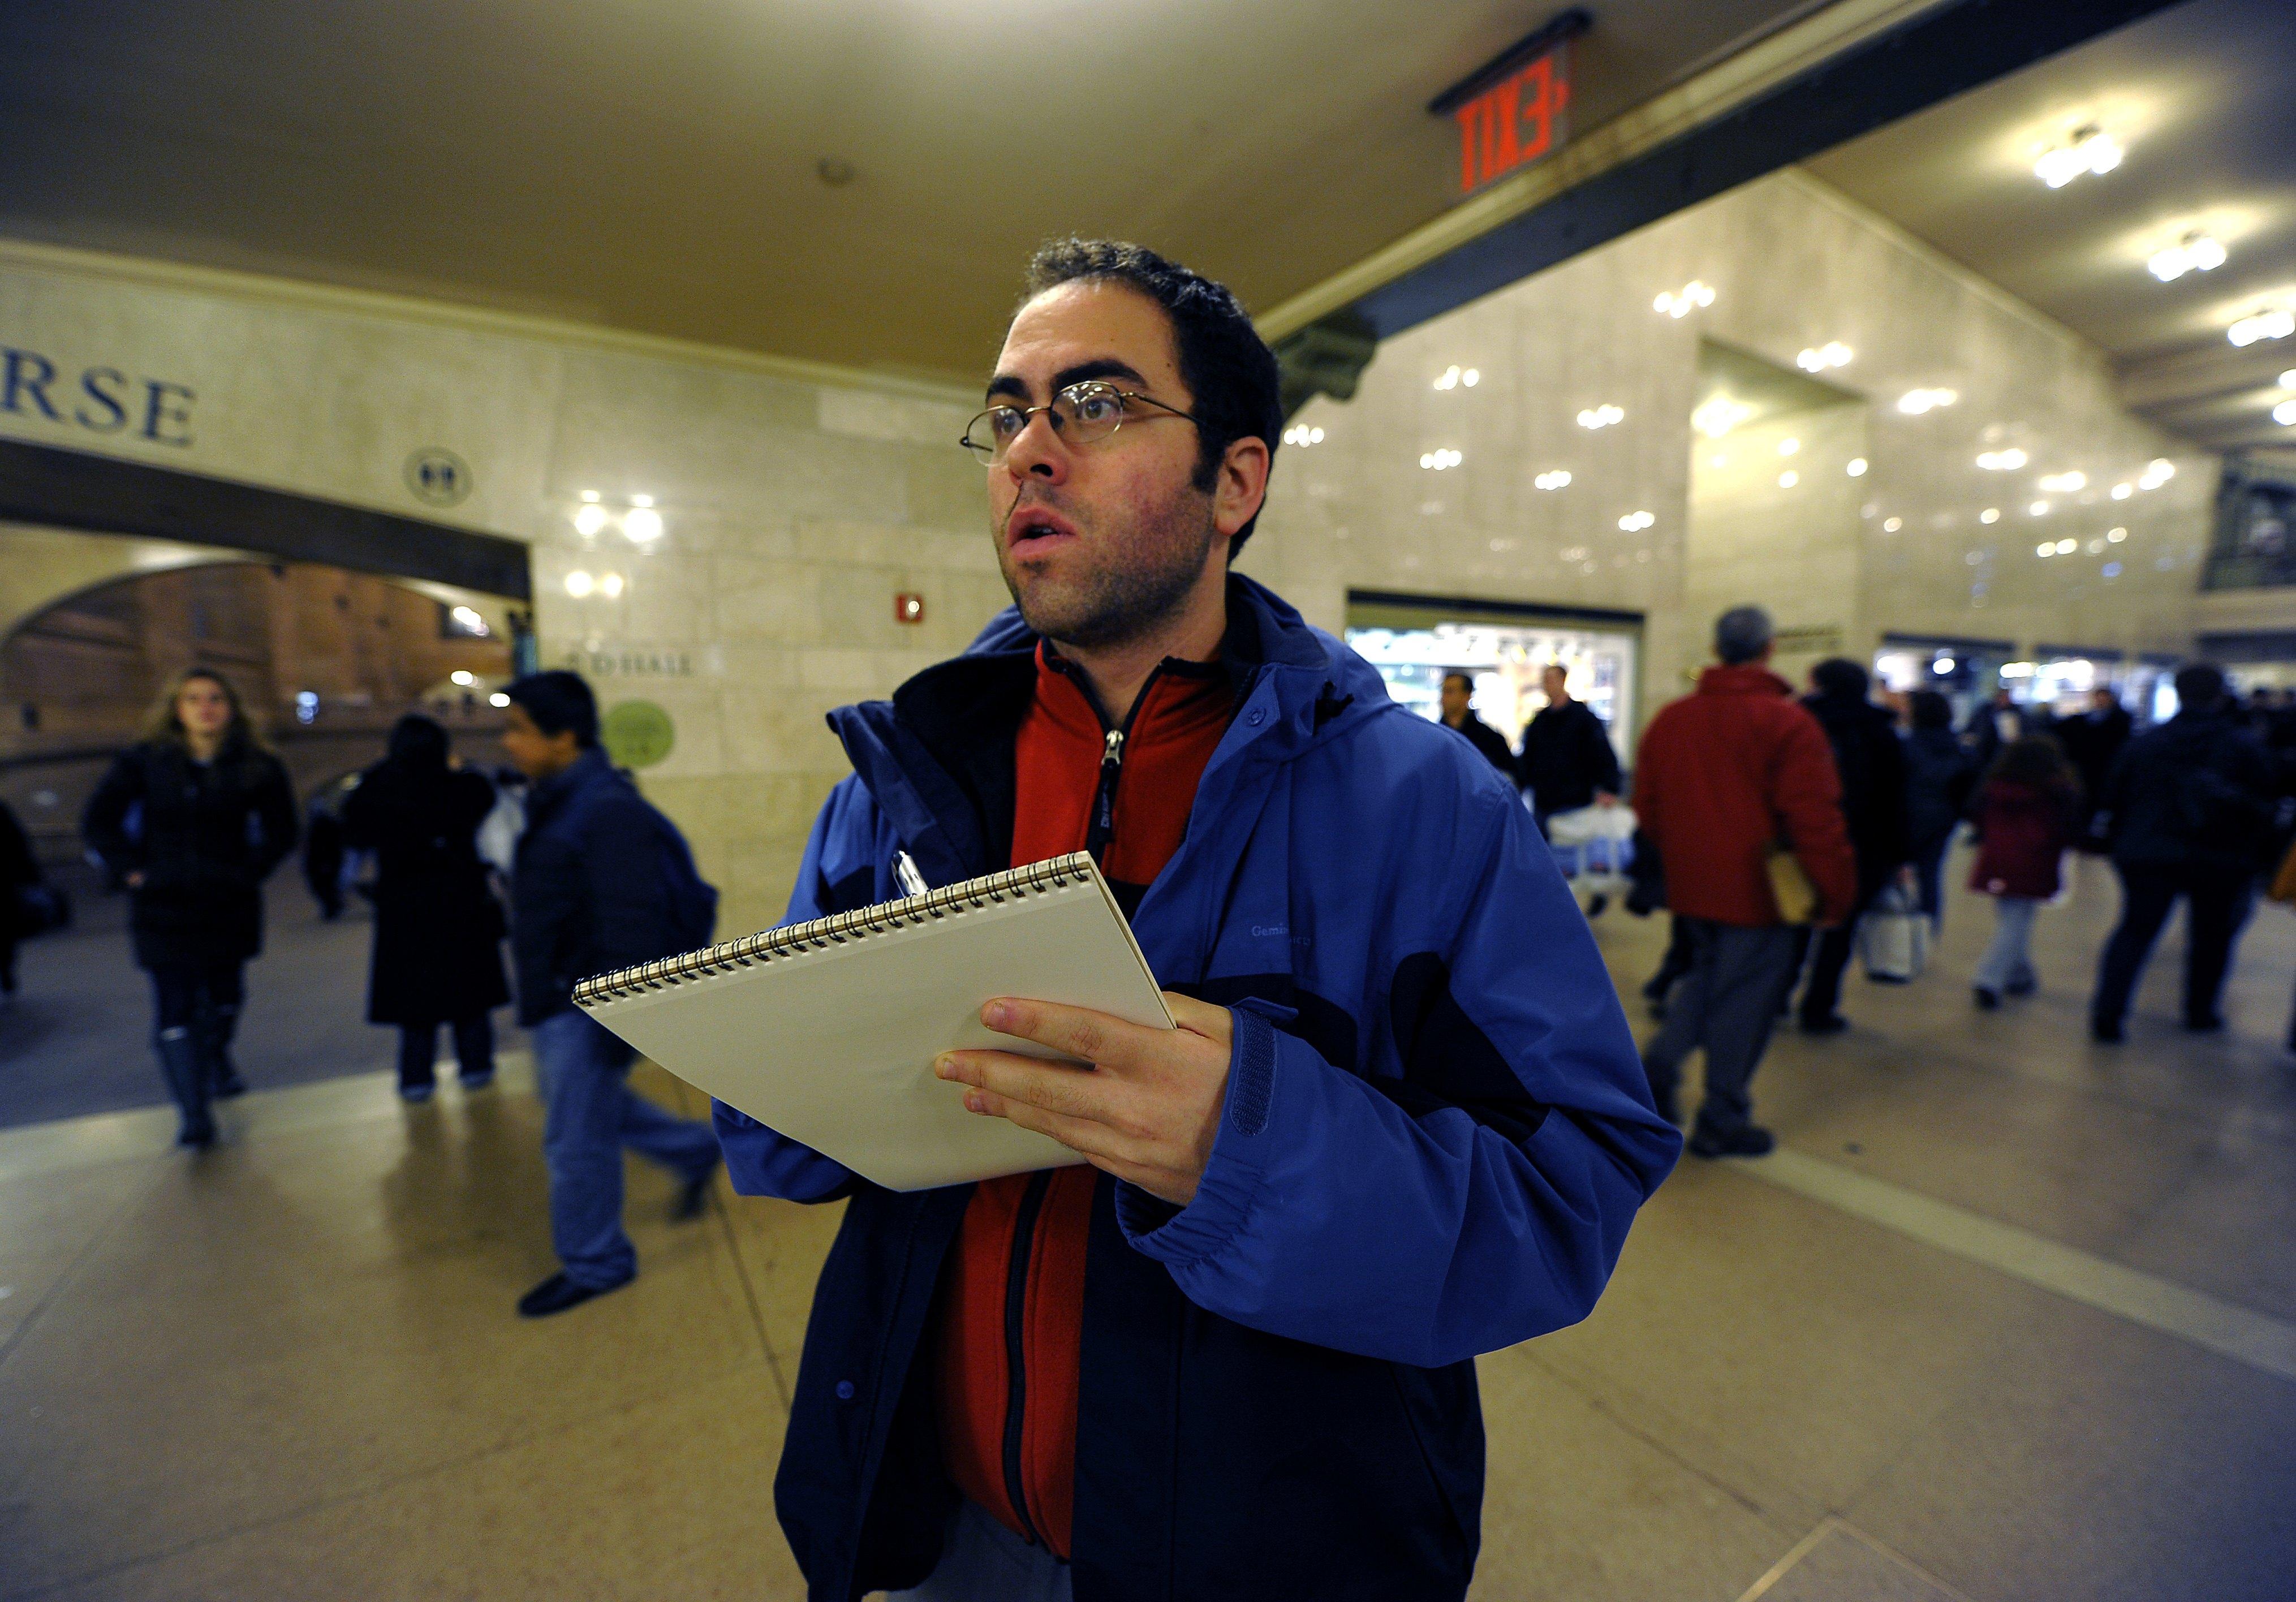 Restaurateurs Mourn Death of Artist Jason Polan, a Fixture in NYC's Food Scene